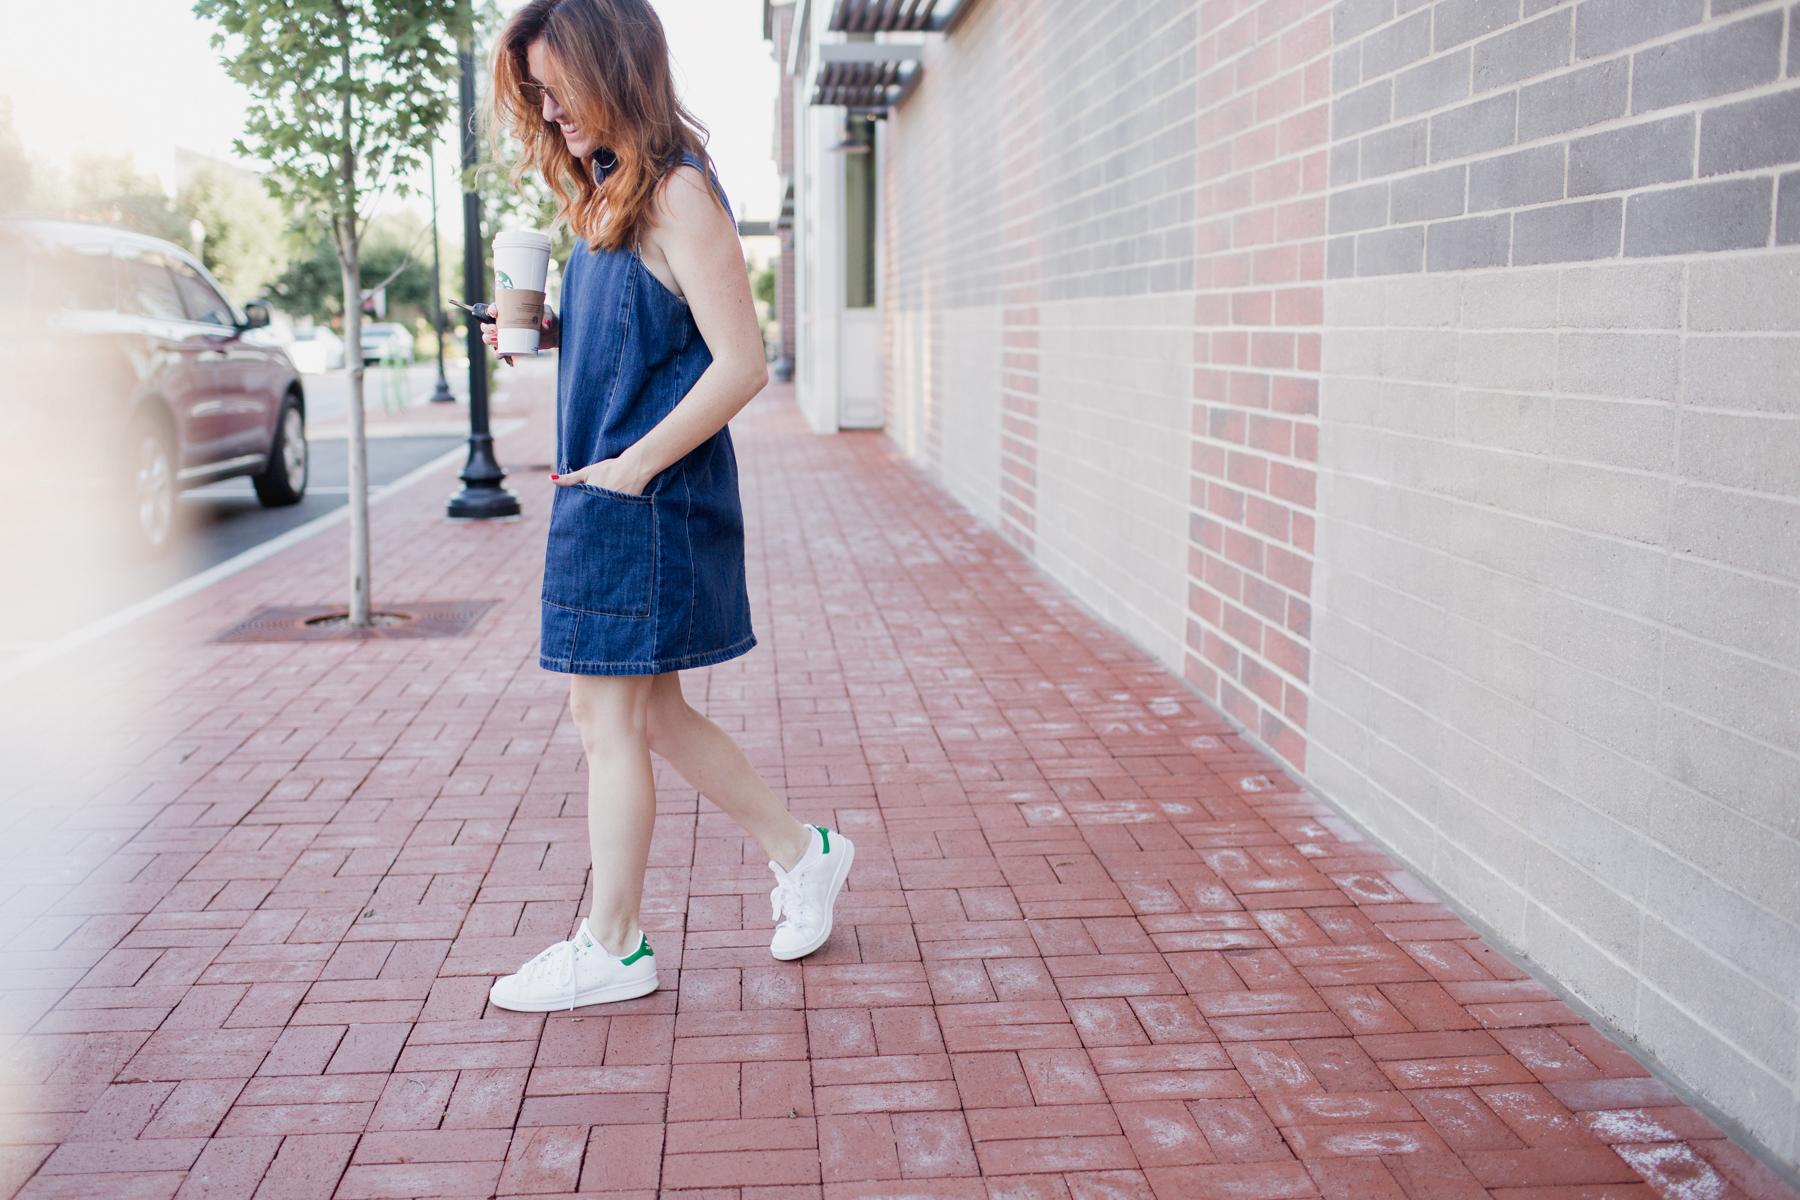 anna_e_cottrell_eldridge_edit_fashion_blogger_mgb_photo_denim_dress_summer_2016_trends_adidas_stan_smith_vintage_jewelry_acne_aviator_sunglasses_coffee_4.jpg